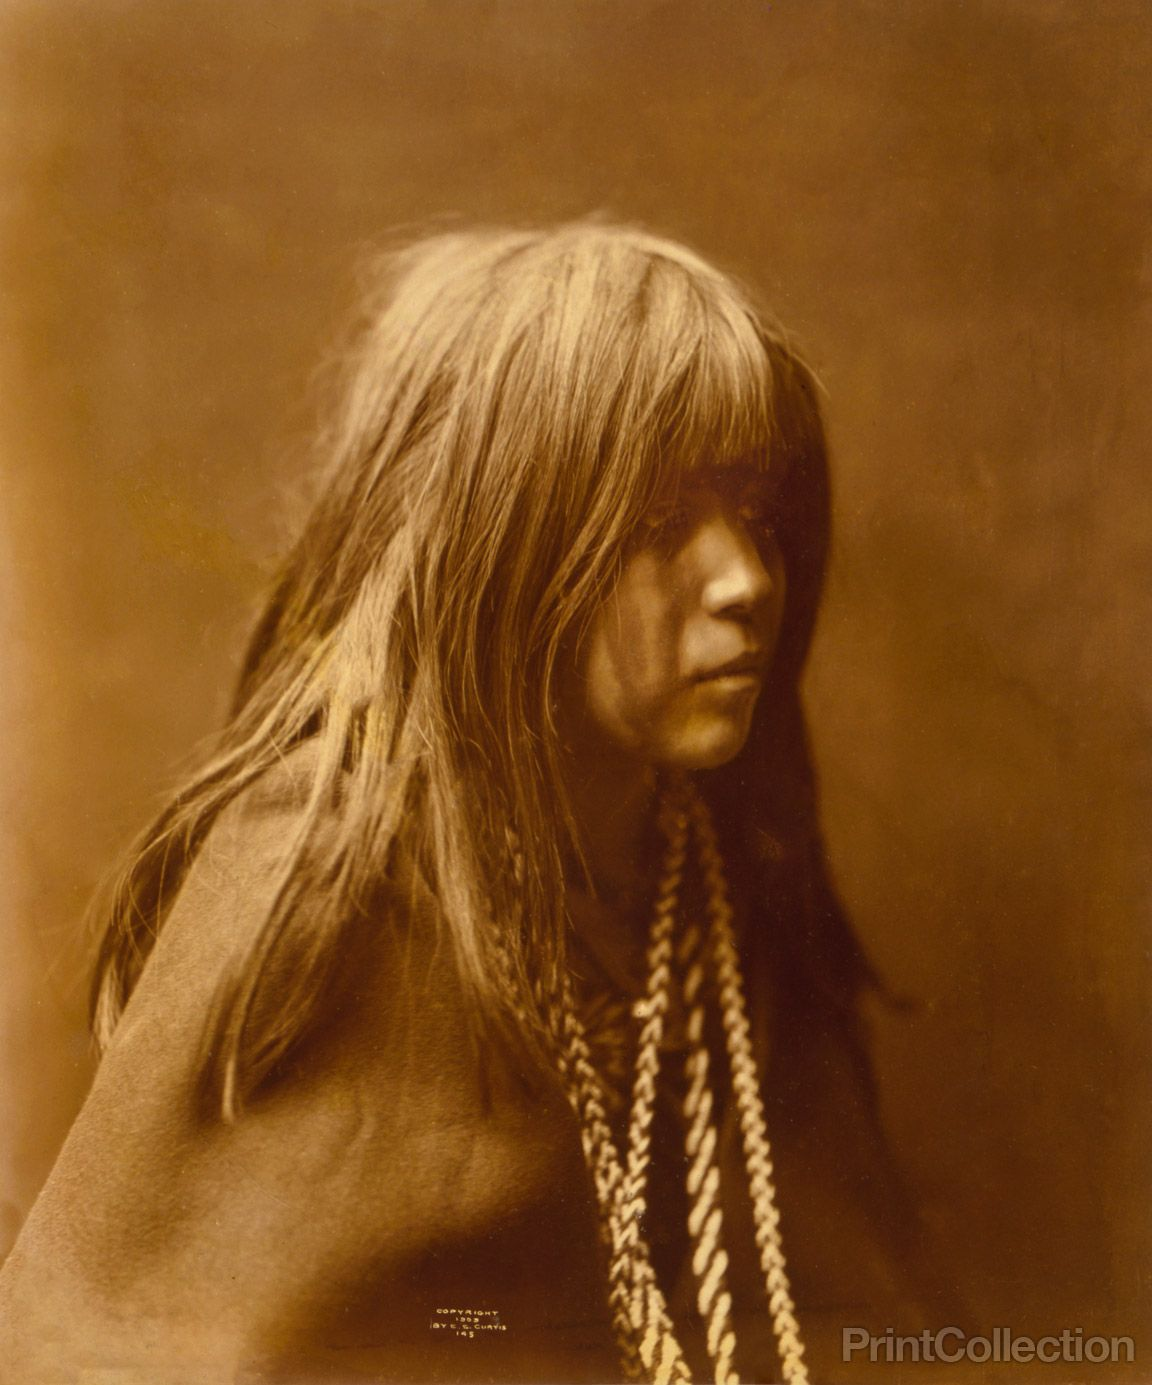 Mosa mojave indian native pics pinterest native american